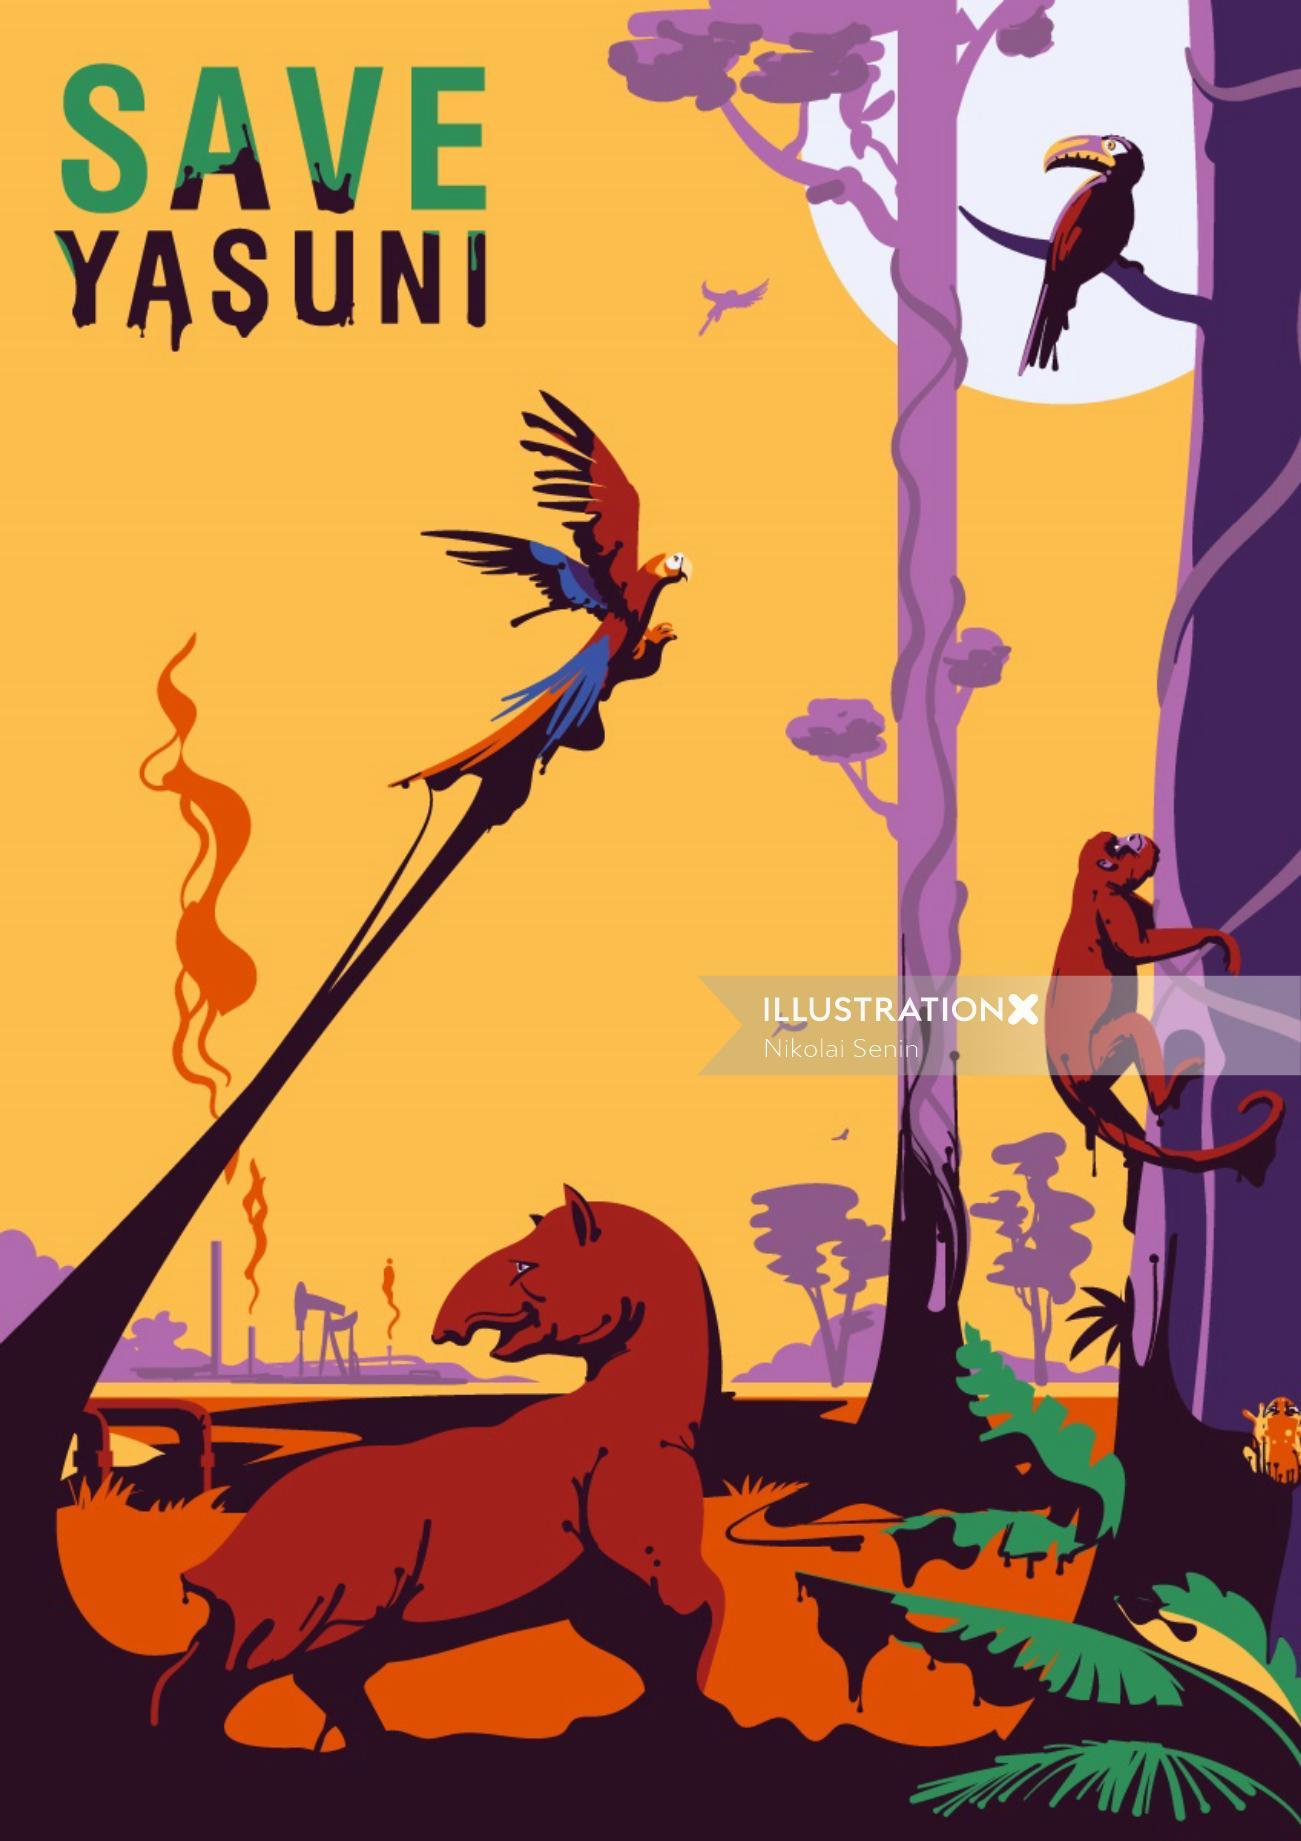 Cover poster design for Save Yasuni National Park